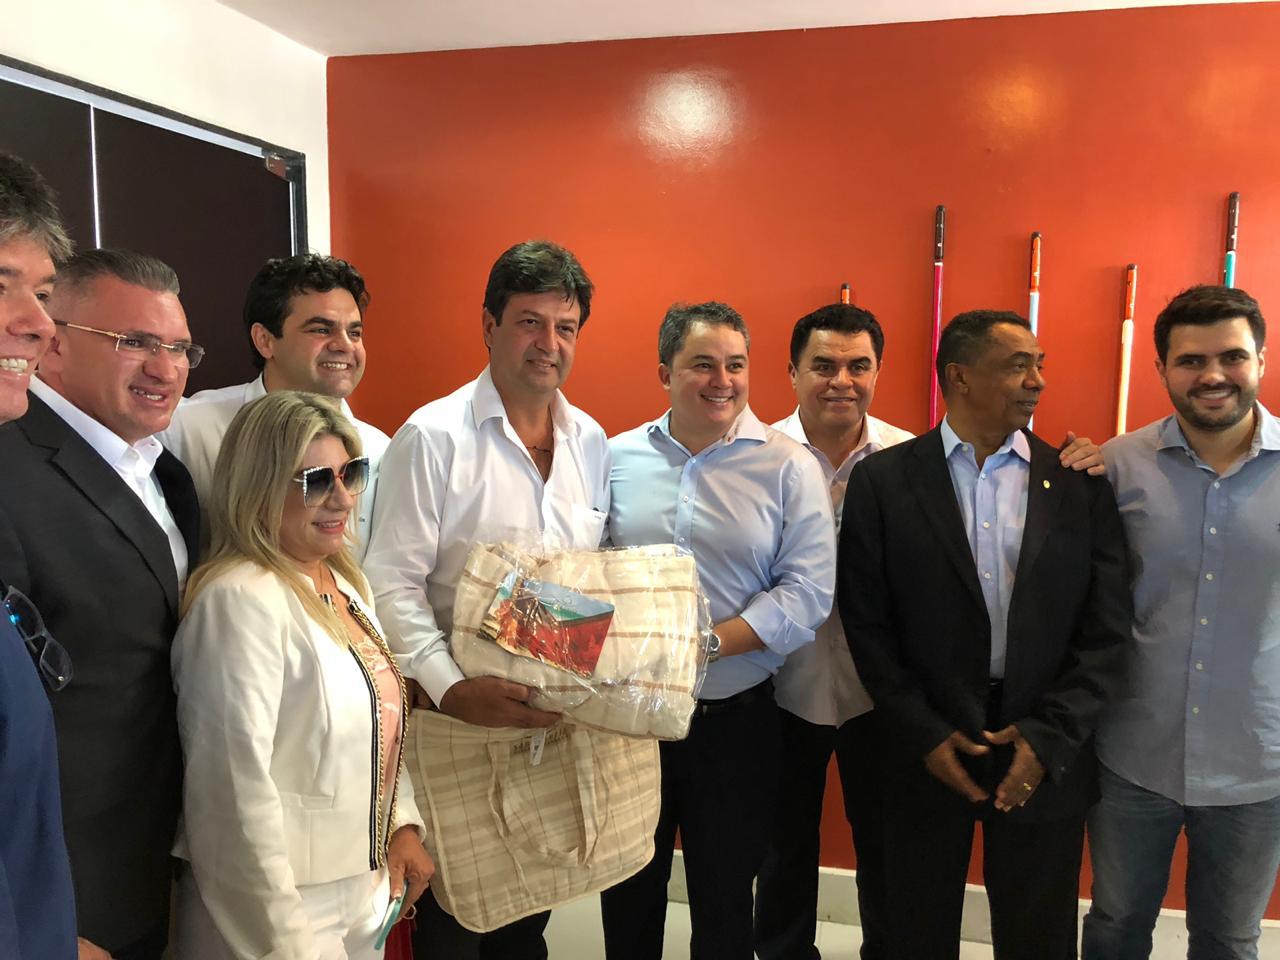 Na Paraíba, políticos recepcionam ministro da Saúde Luiz Henrique Mandetta